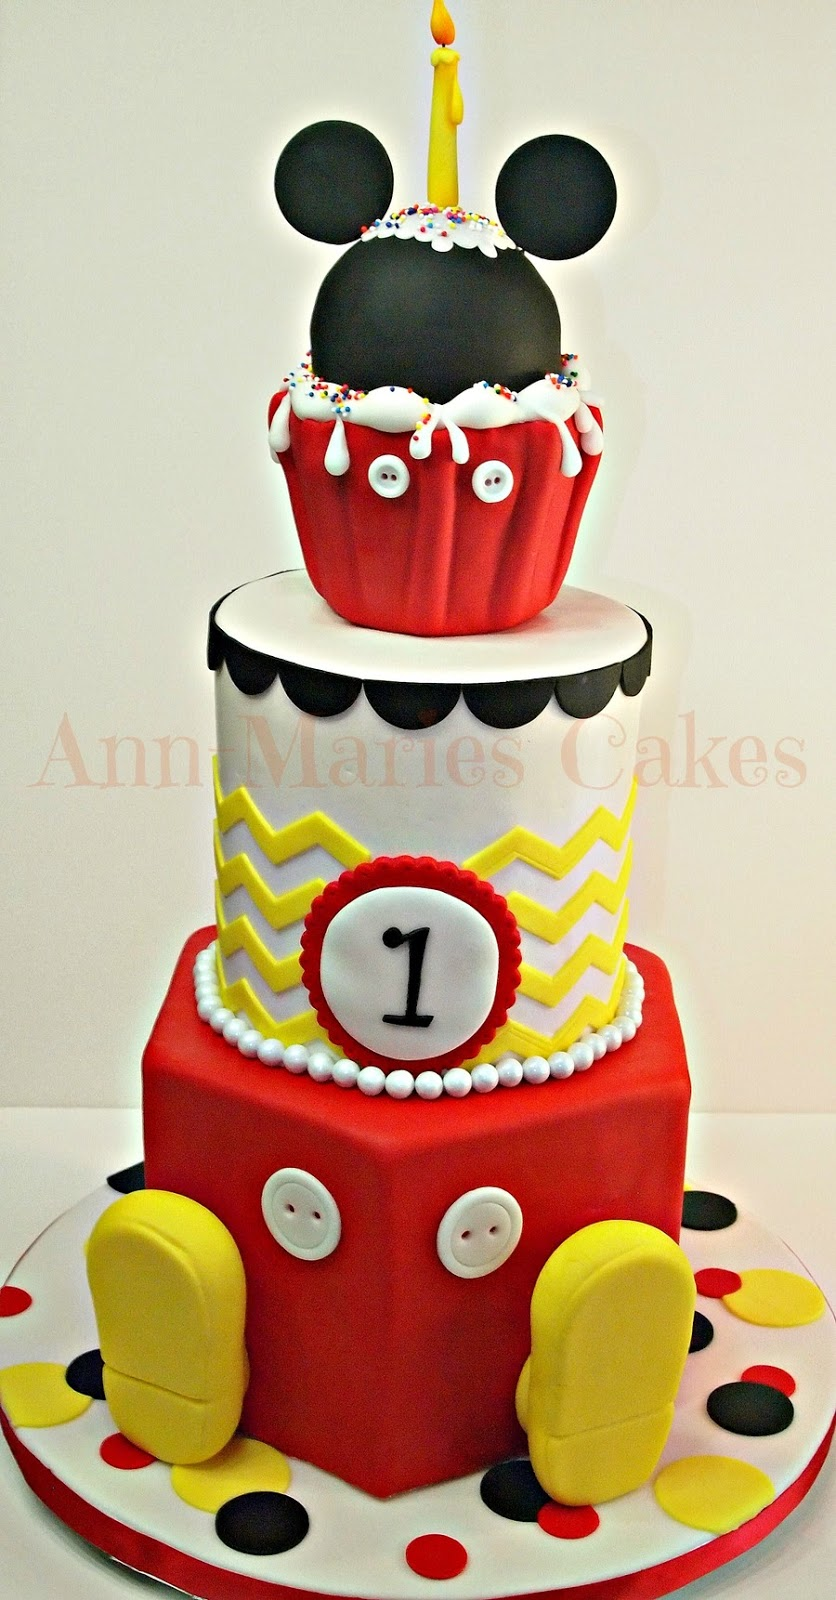 The Sensational Cakes Mickey And Minnie Theme Birthday